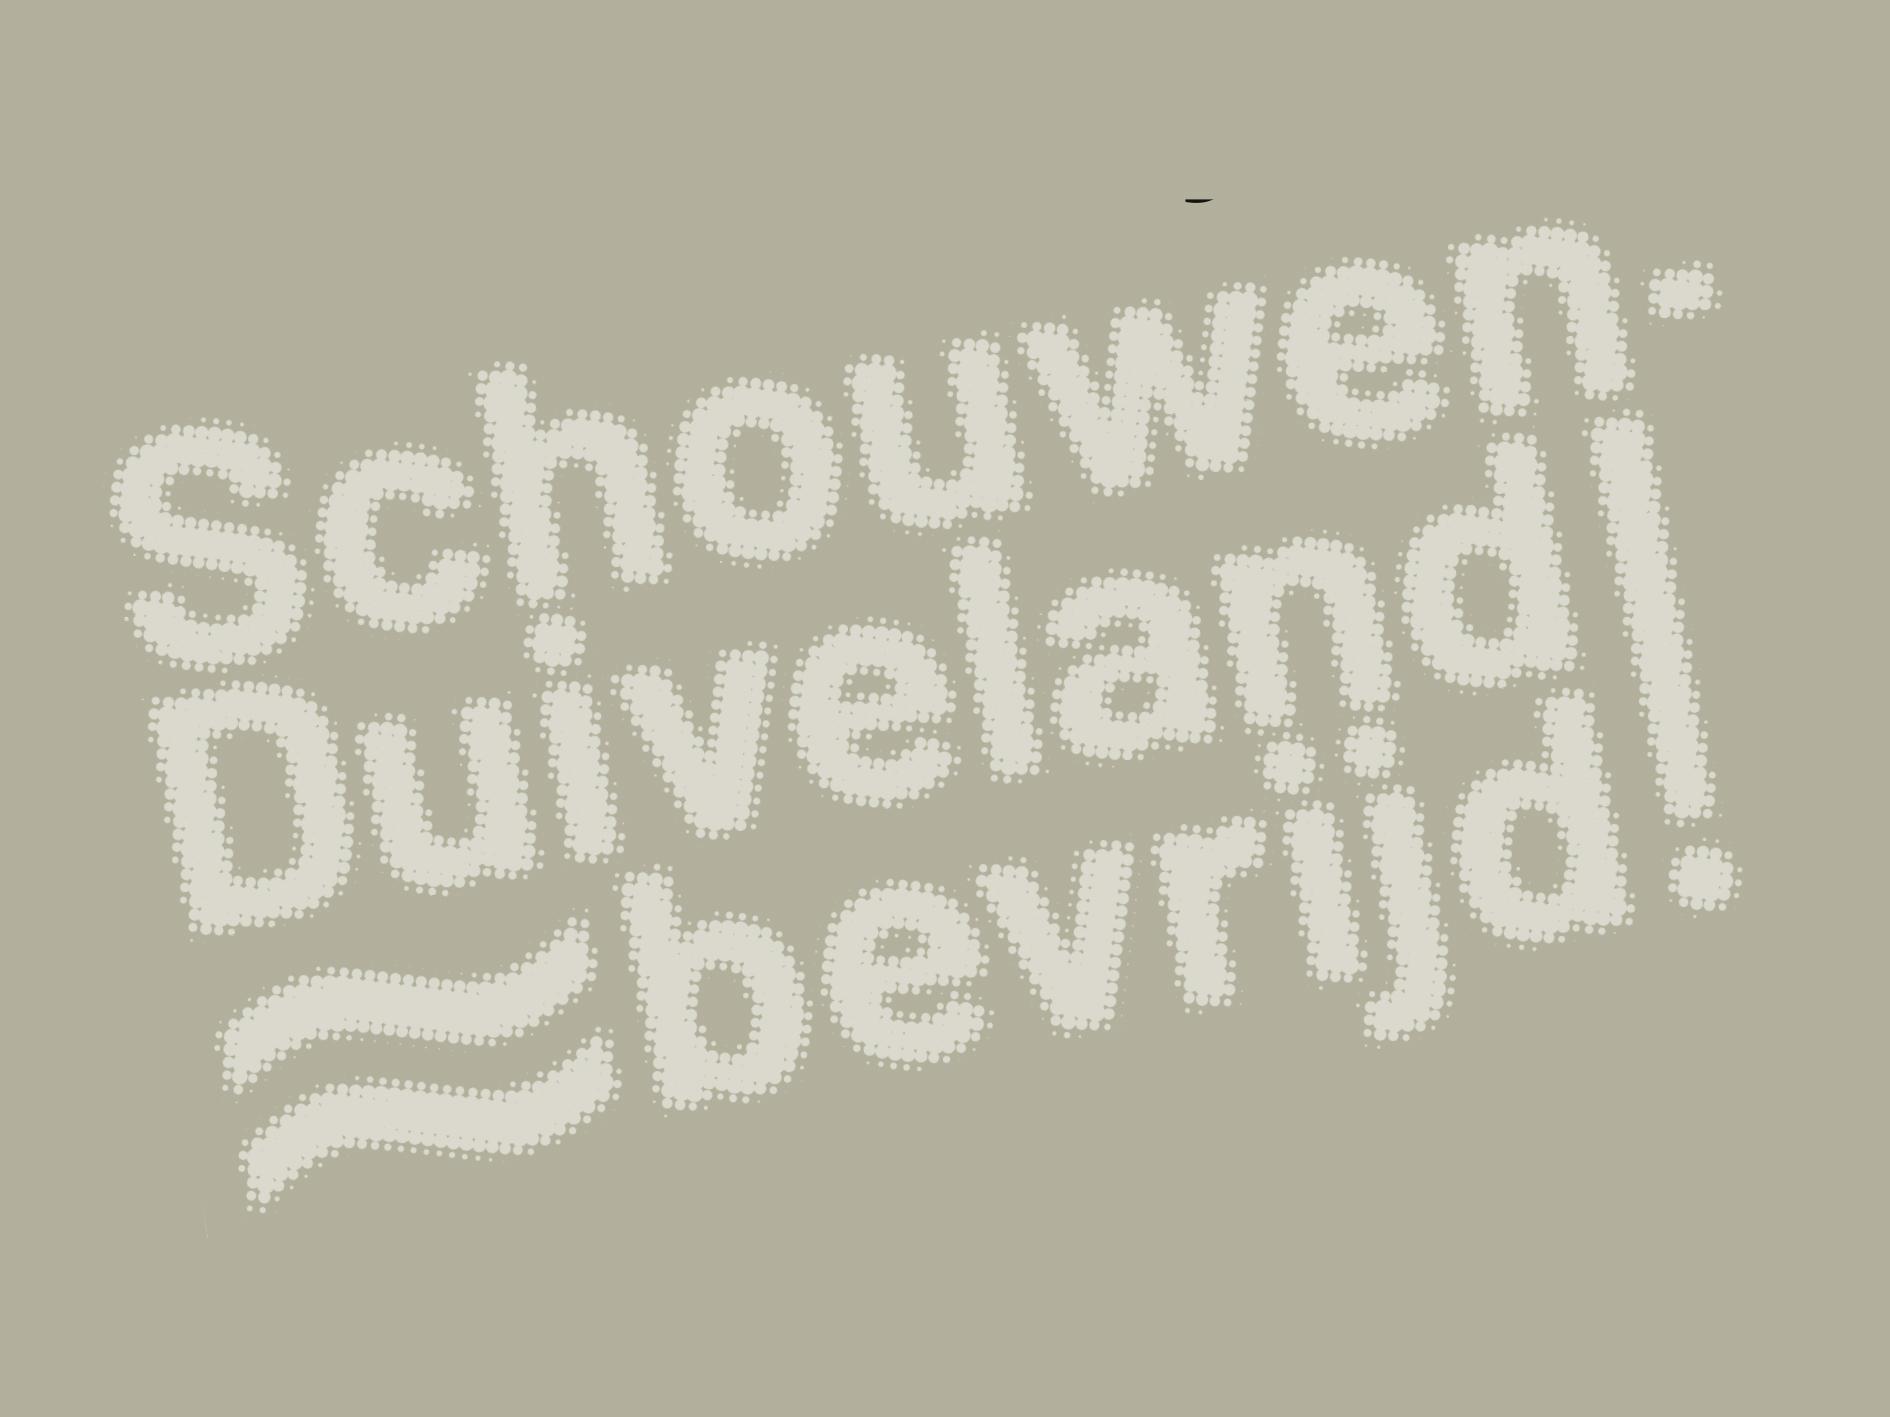 Museumhaven Zeeland - Schouwen-Duiveland Bevrijd 2020